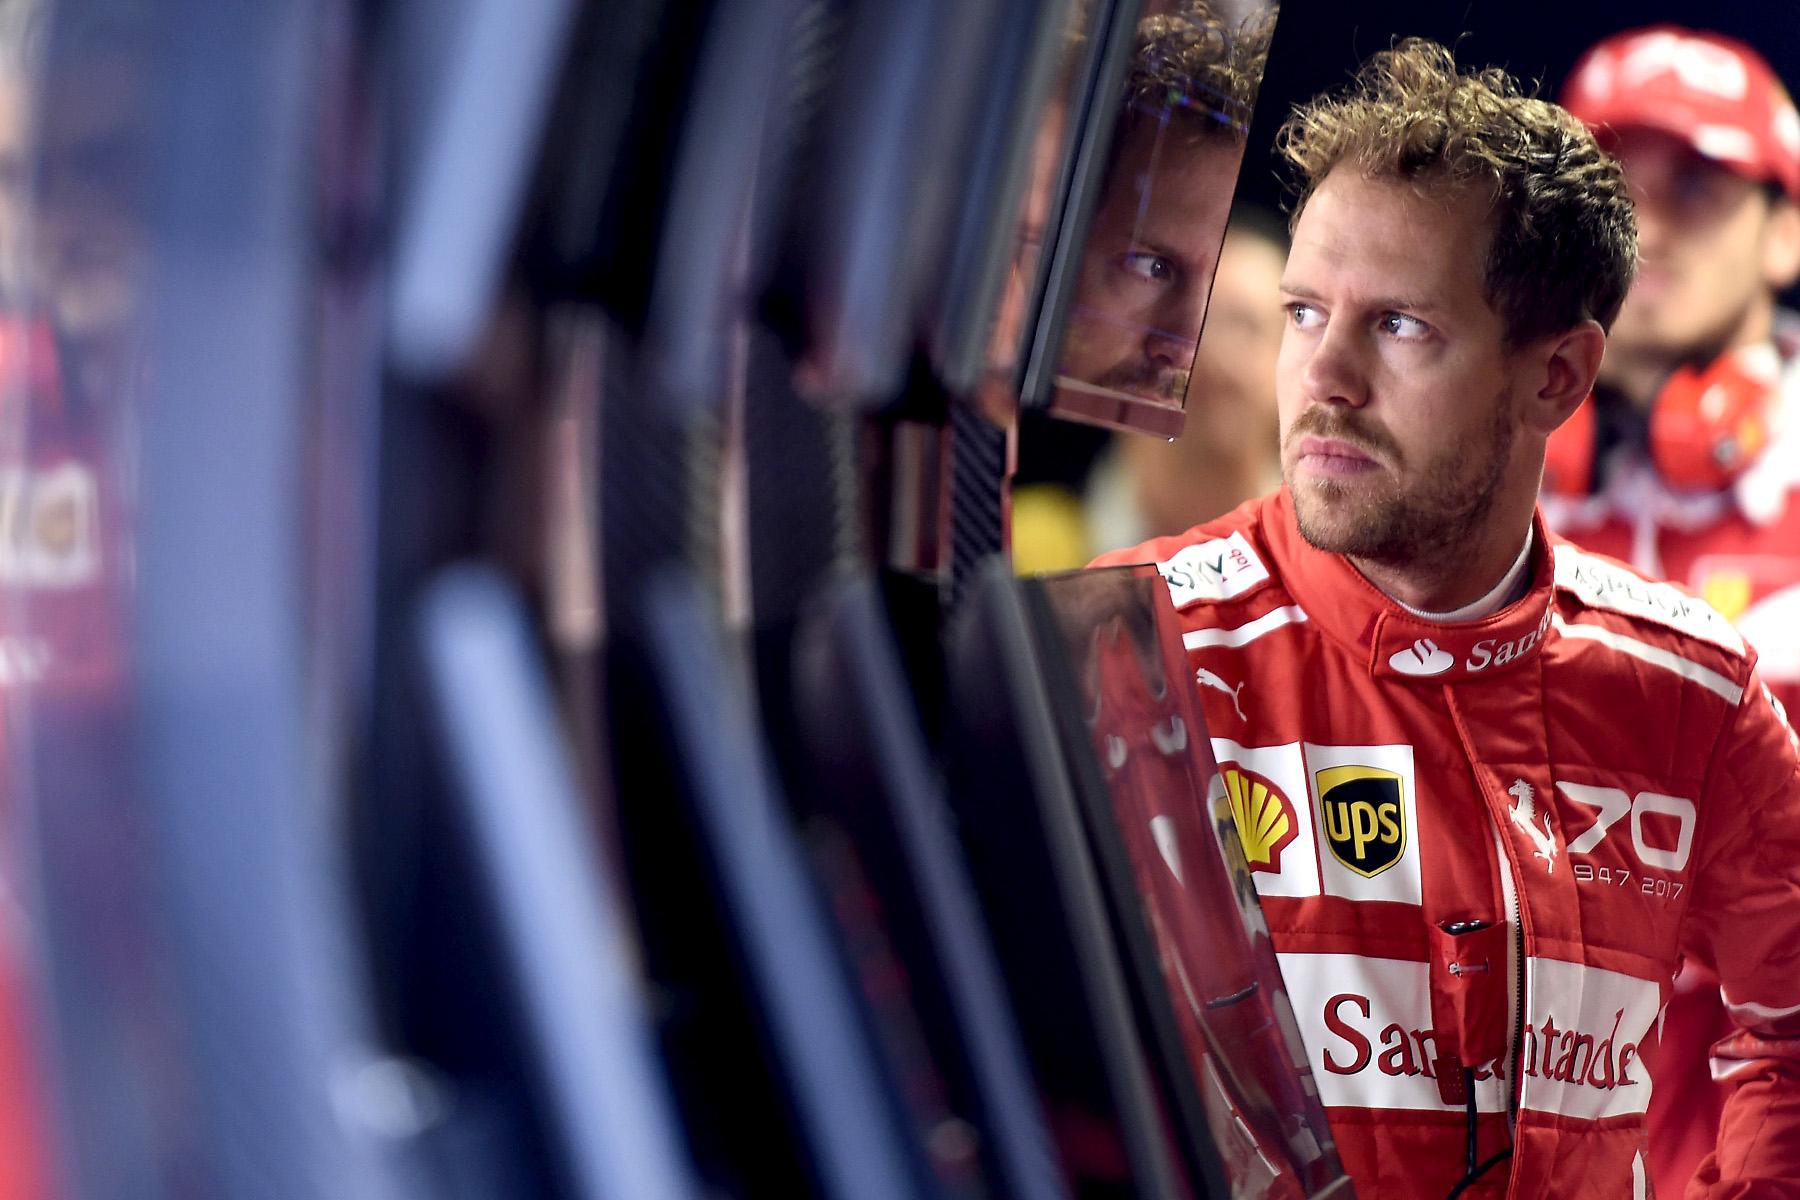 Sebastian Vettel in his garage at the 2017 Italian Grand Prix